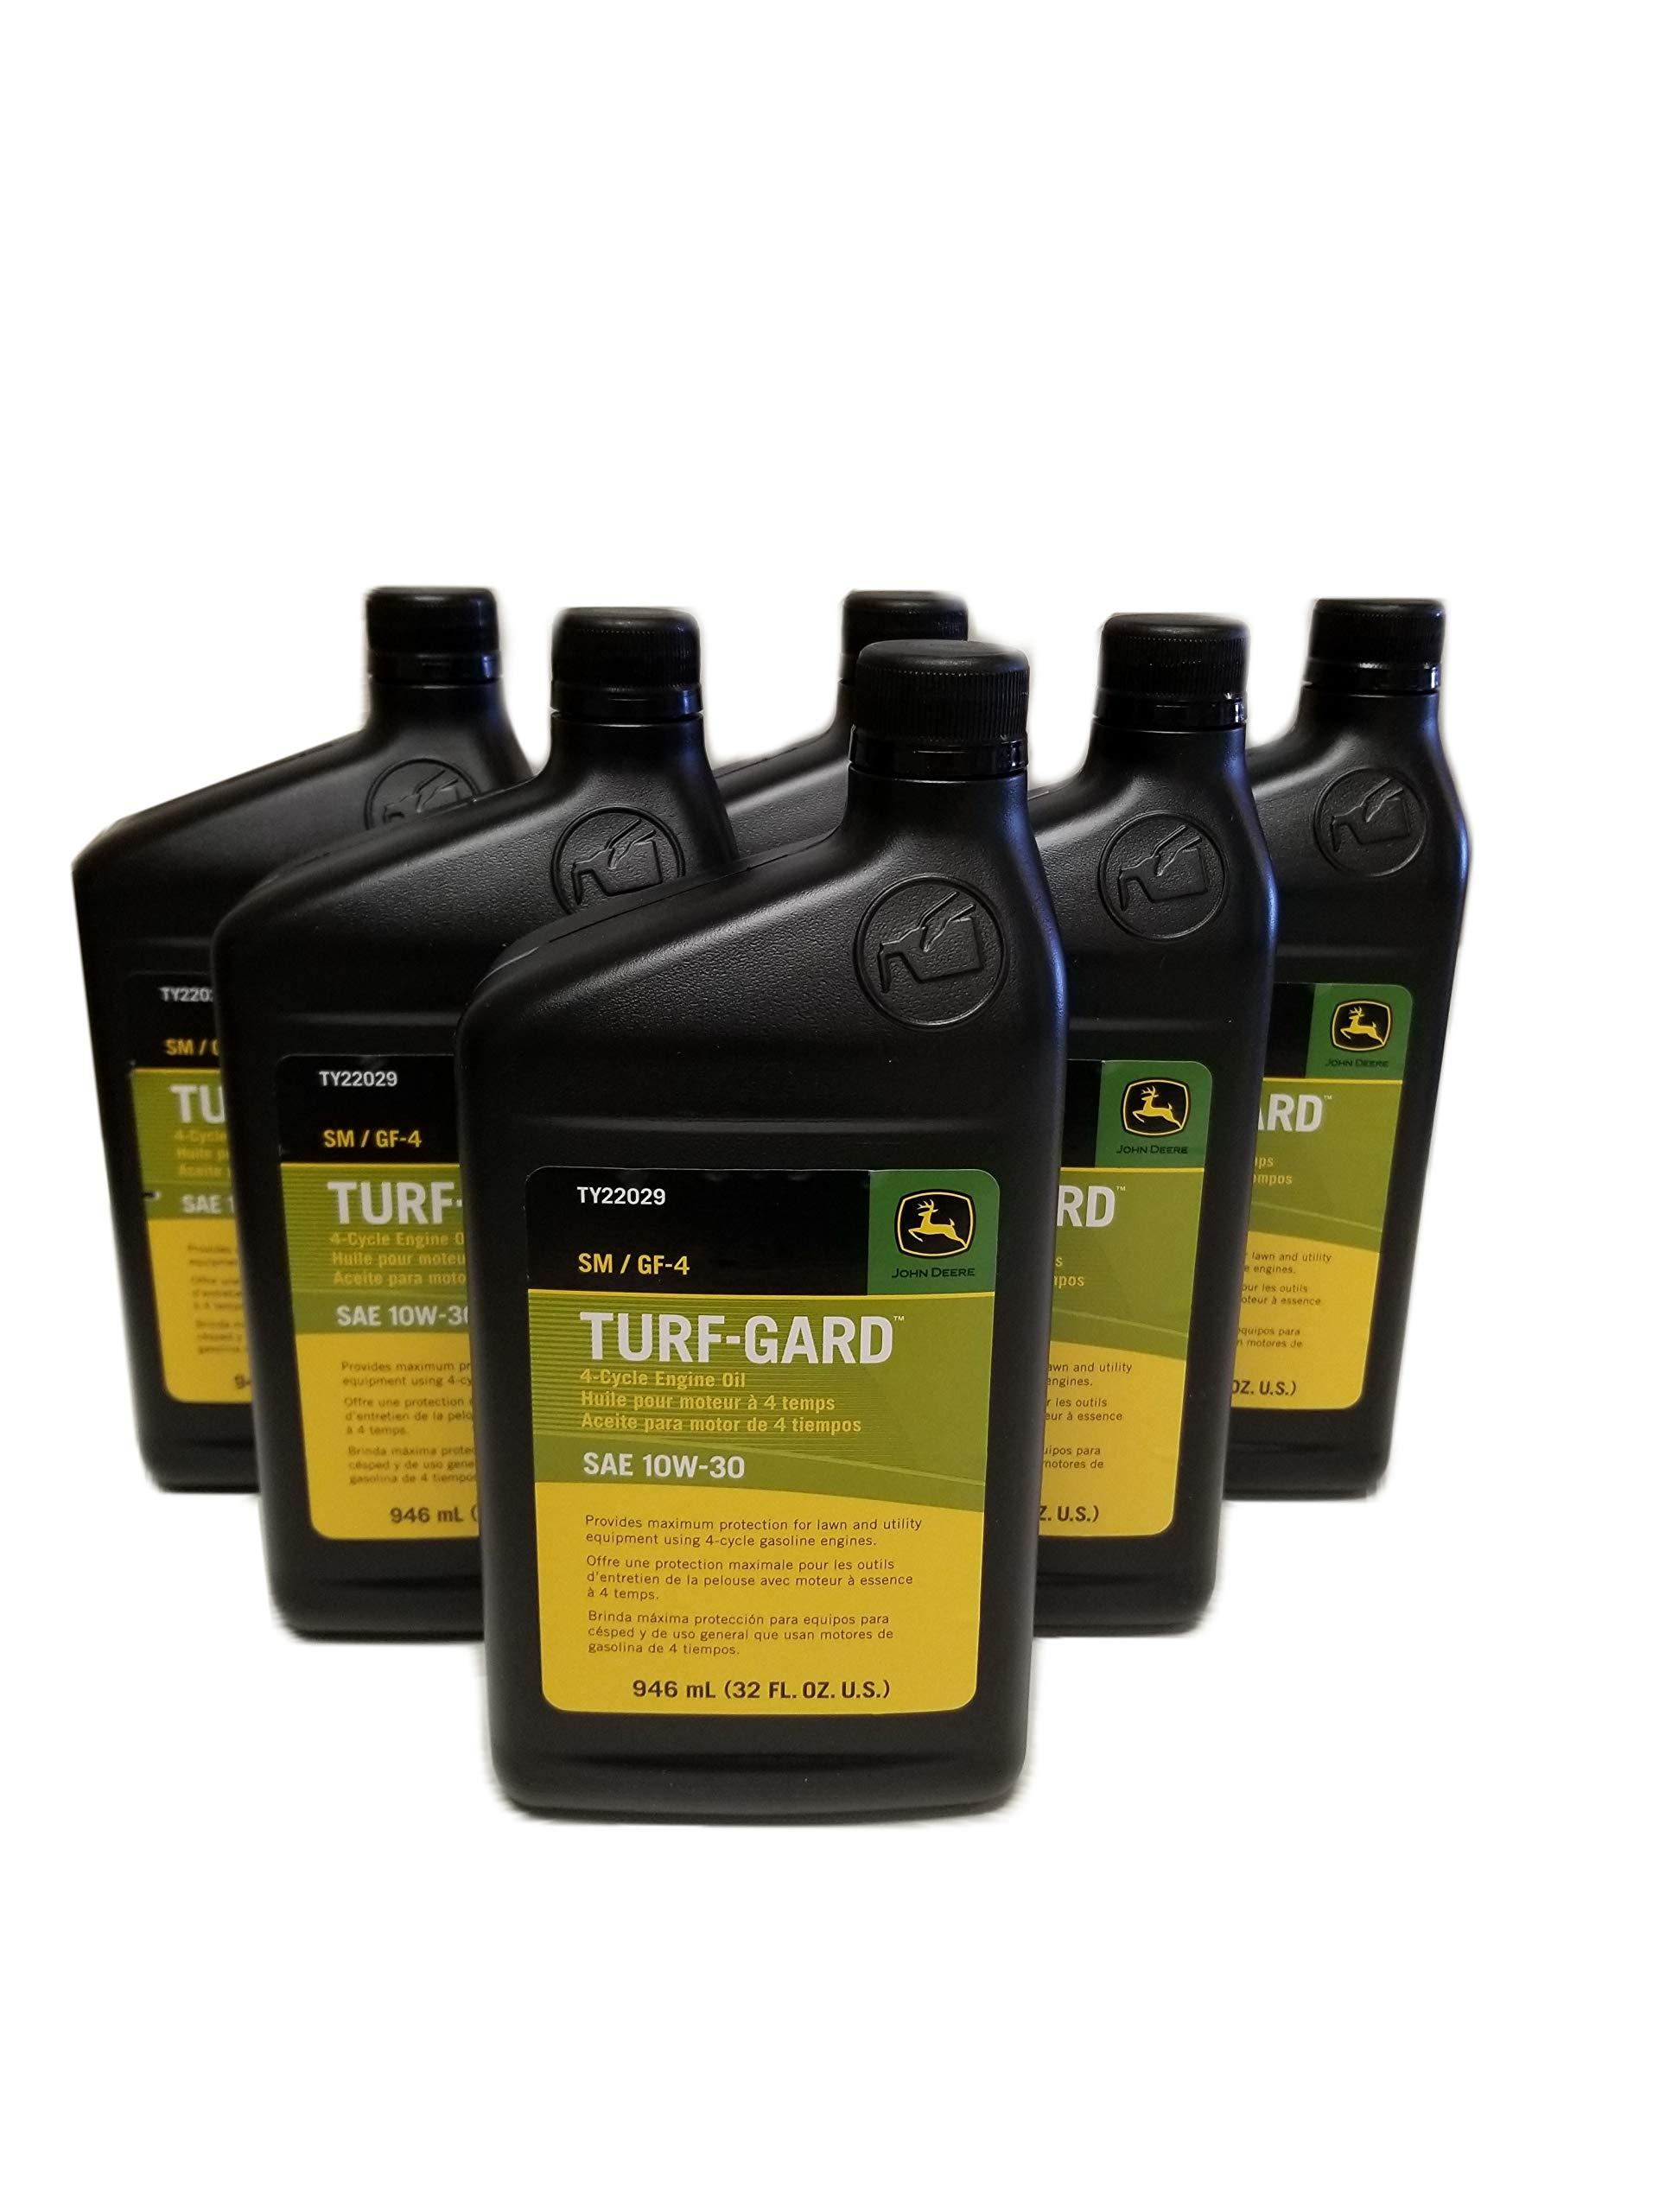 John Deere Turf-Gard SAE 10W-30 Oil Quarts - TY22029 (Qty of 6)